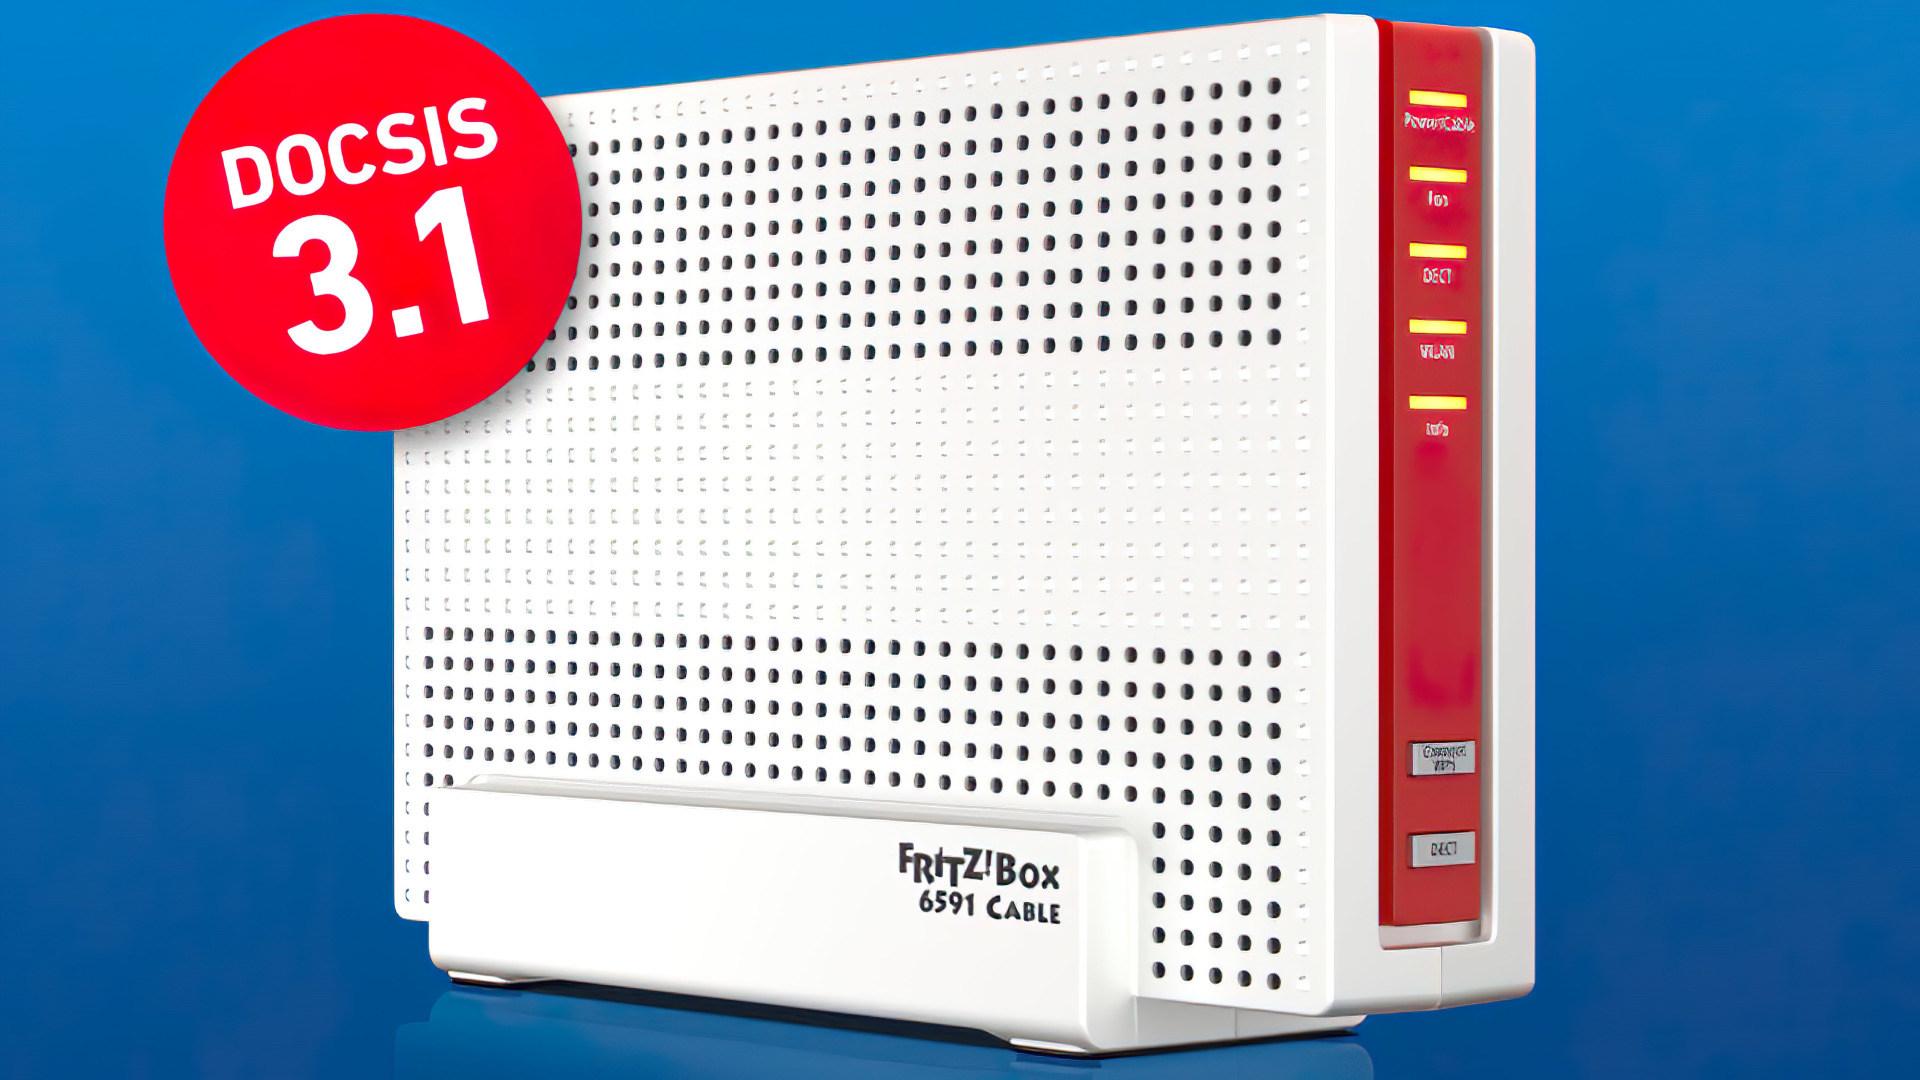 Avm, Fritzbox, FritzBox 6591 Cable